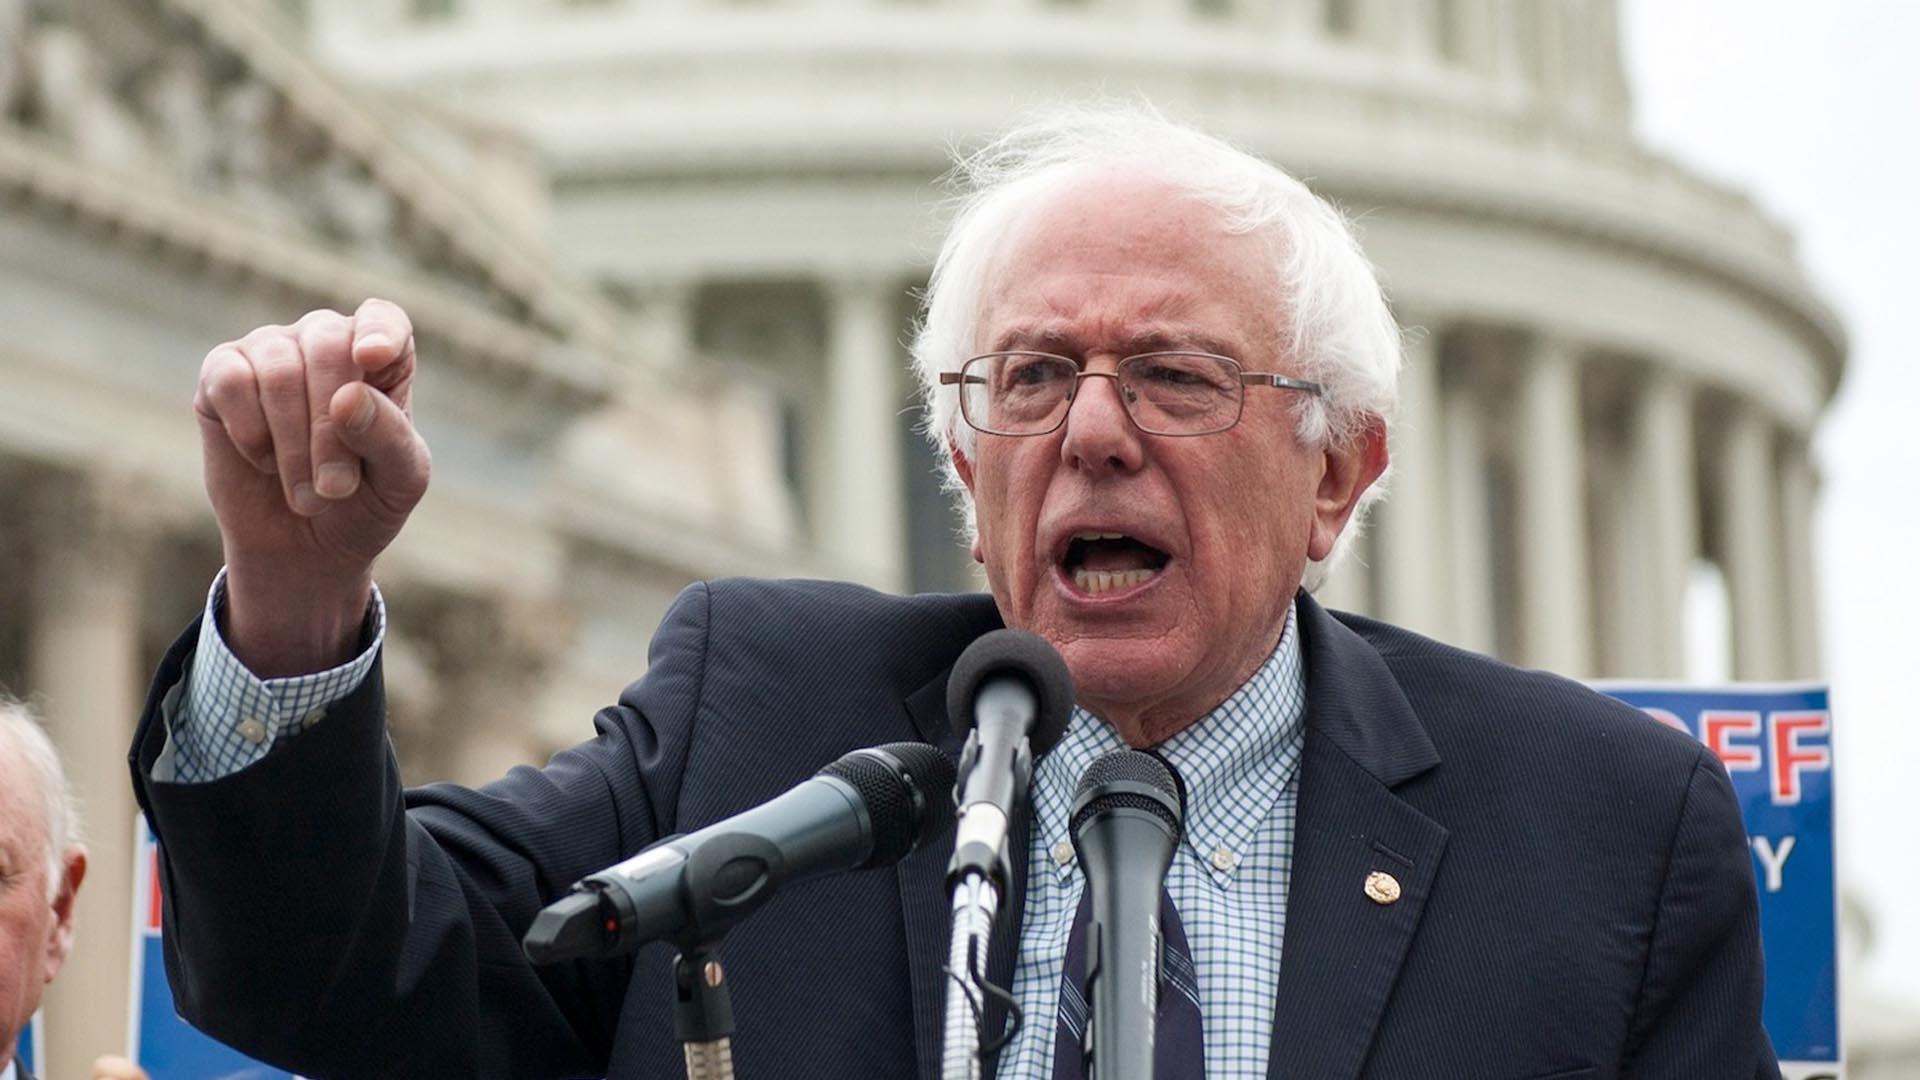 Bernie Sanders Car, House, Wealth, Net Worth, Parents, Height